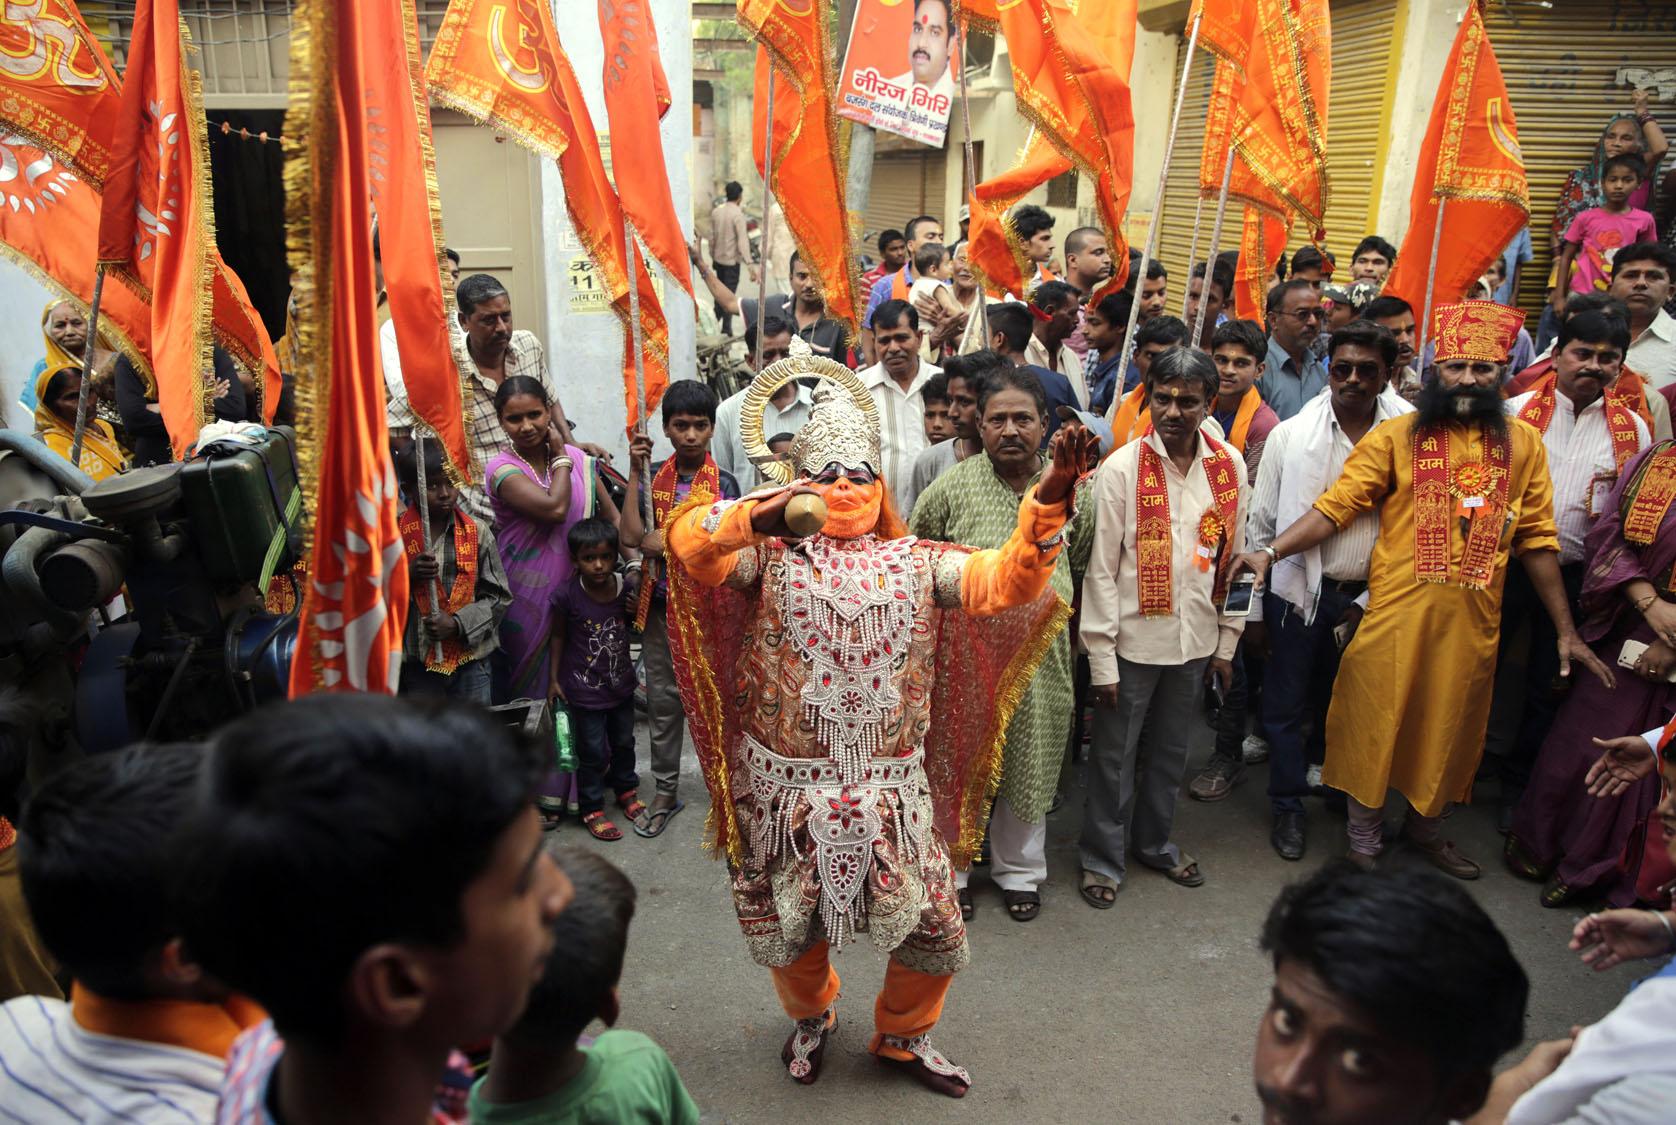 hindu festivals New jersey school holiday list adds 19 hindu festivals including navaratri,  dussehra, diwali, onam & pongal for indian-origin students check new jersey.